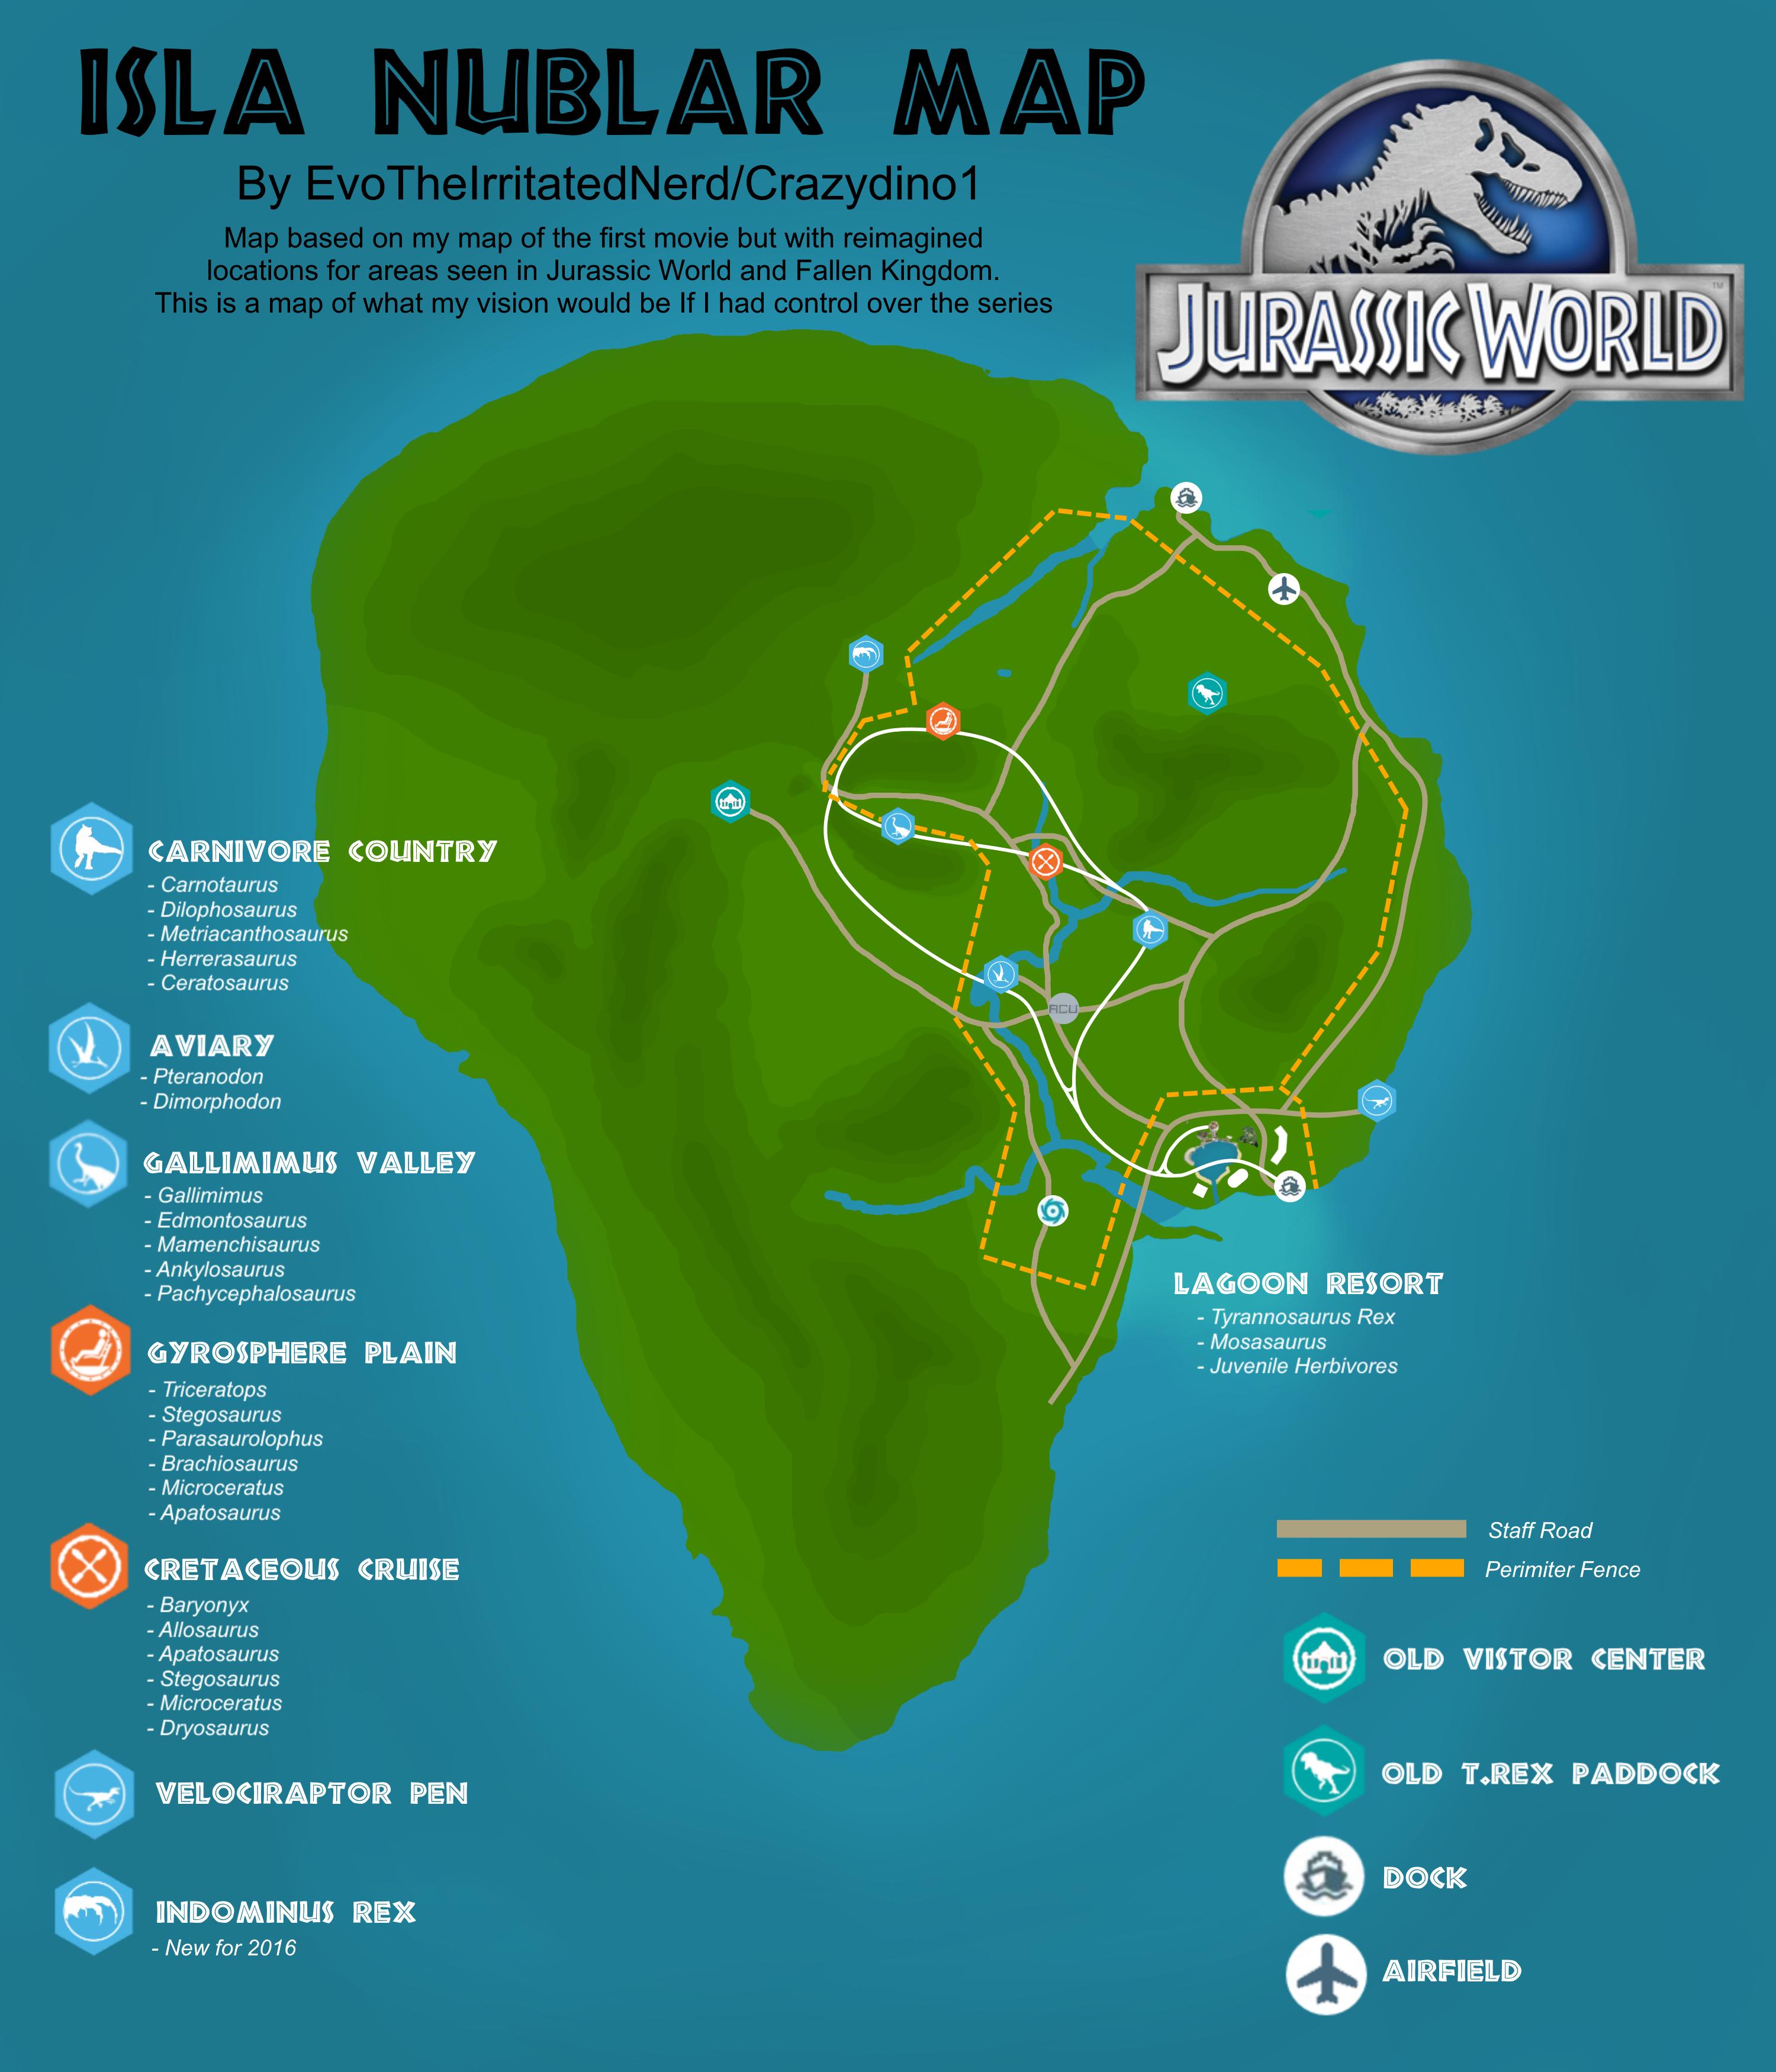 Picture of: Isla Nublar Map Jurassic World Version Fandom